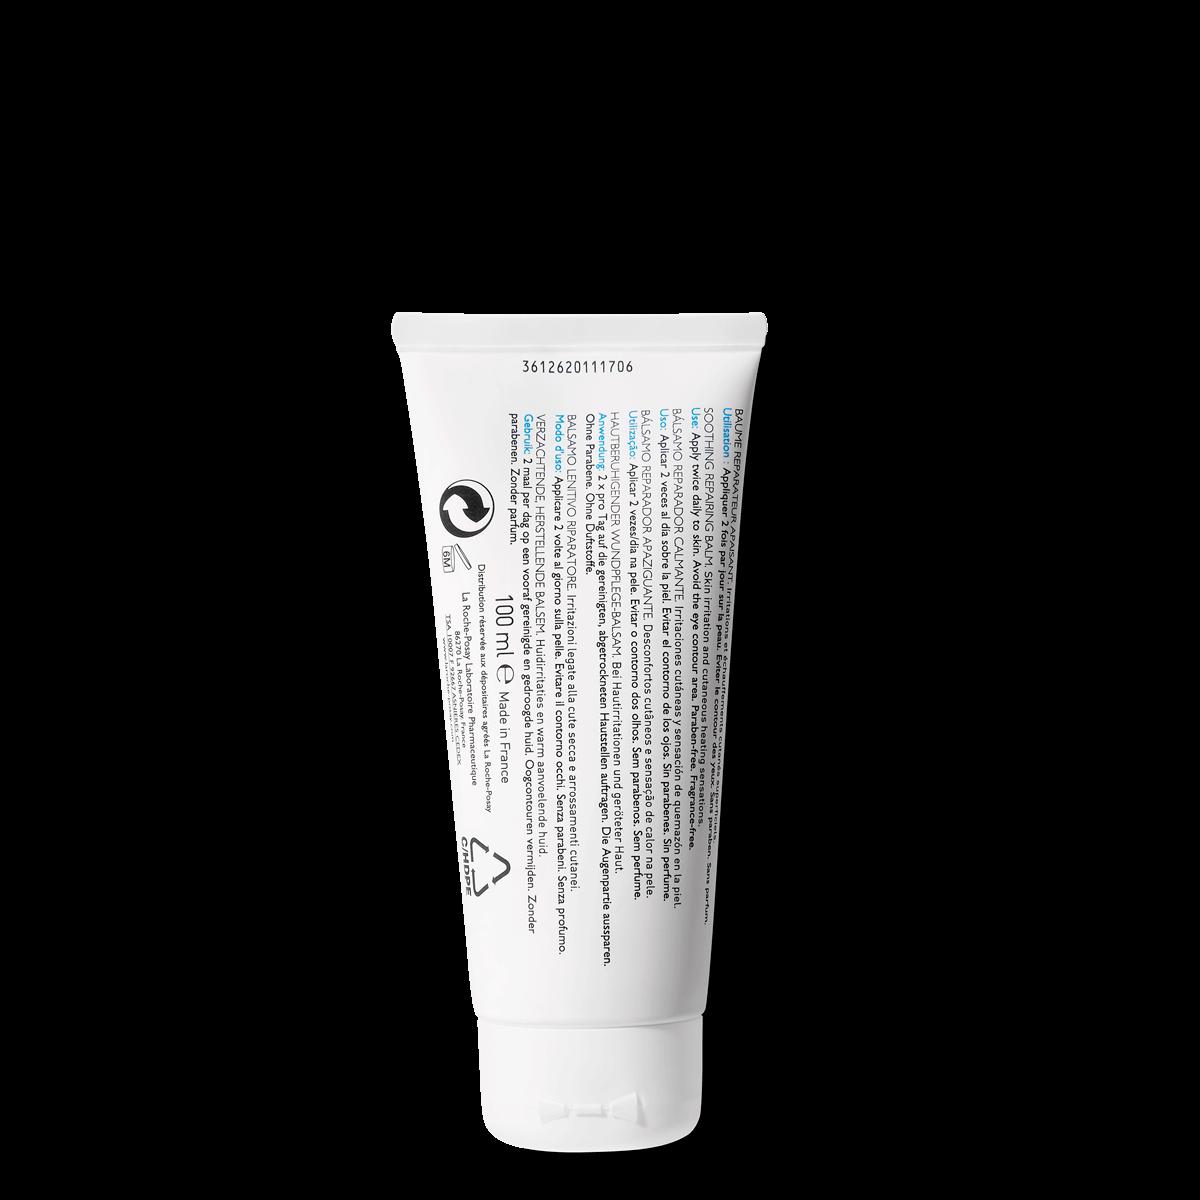 rótulo cicaplast baume b5 para pele danificada 100ml